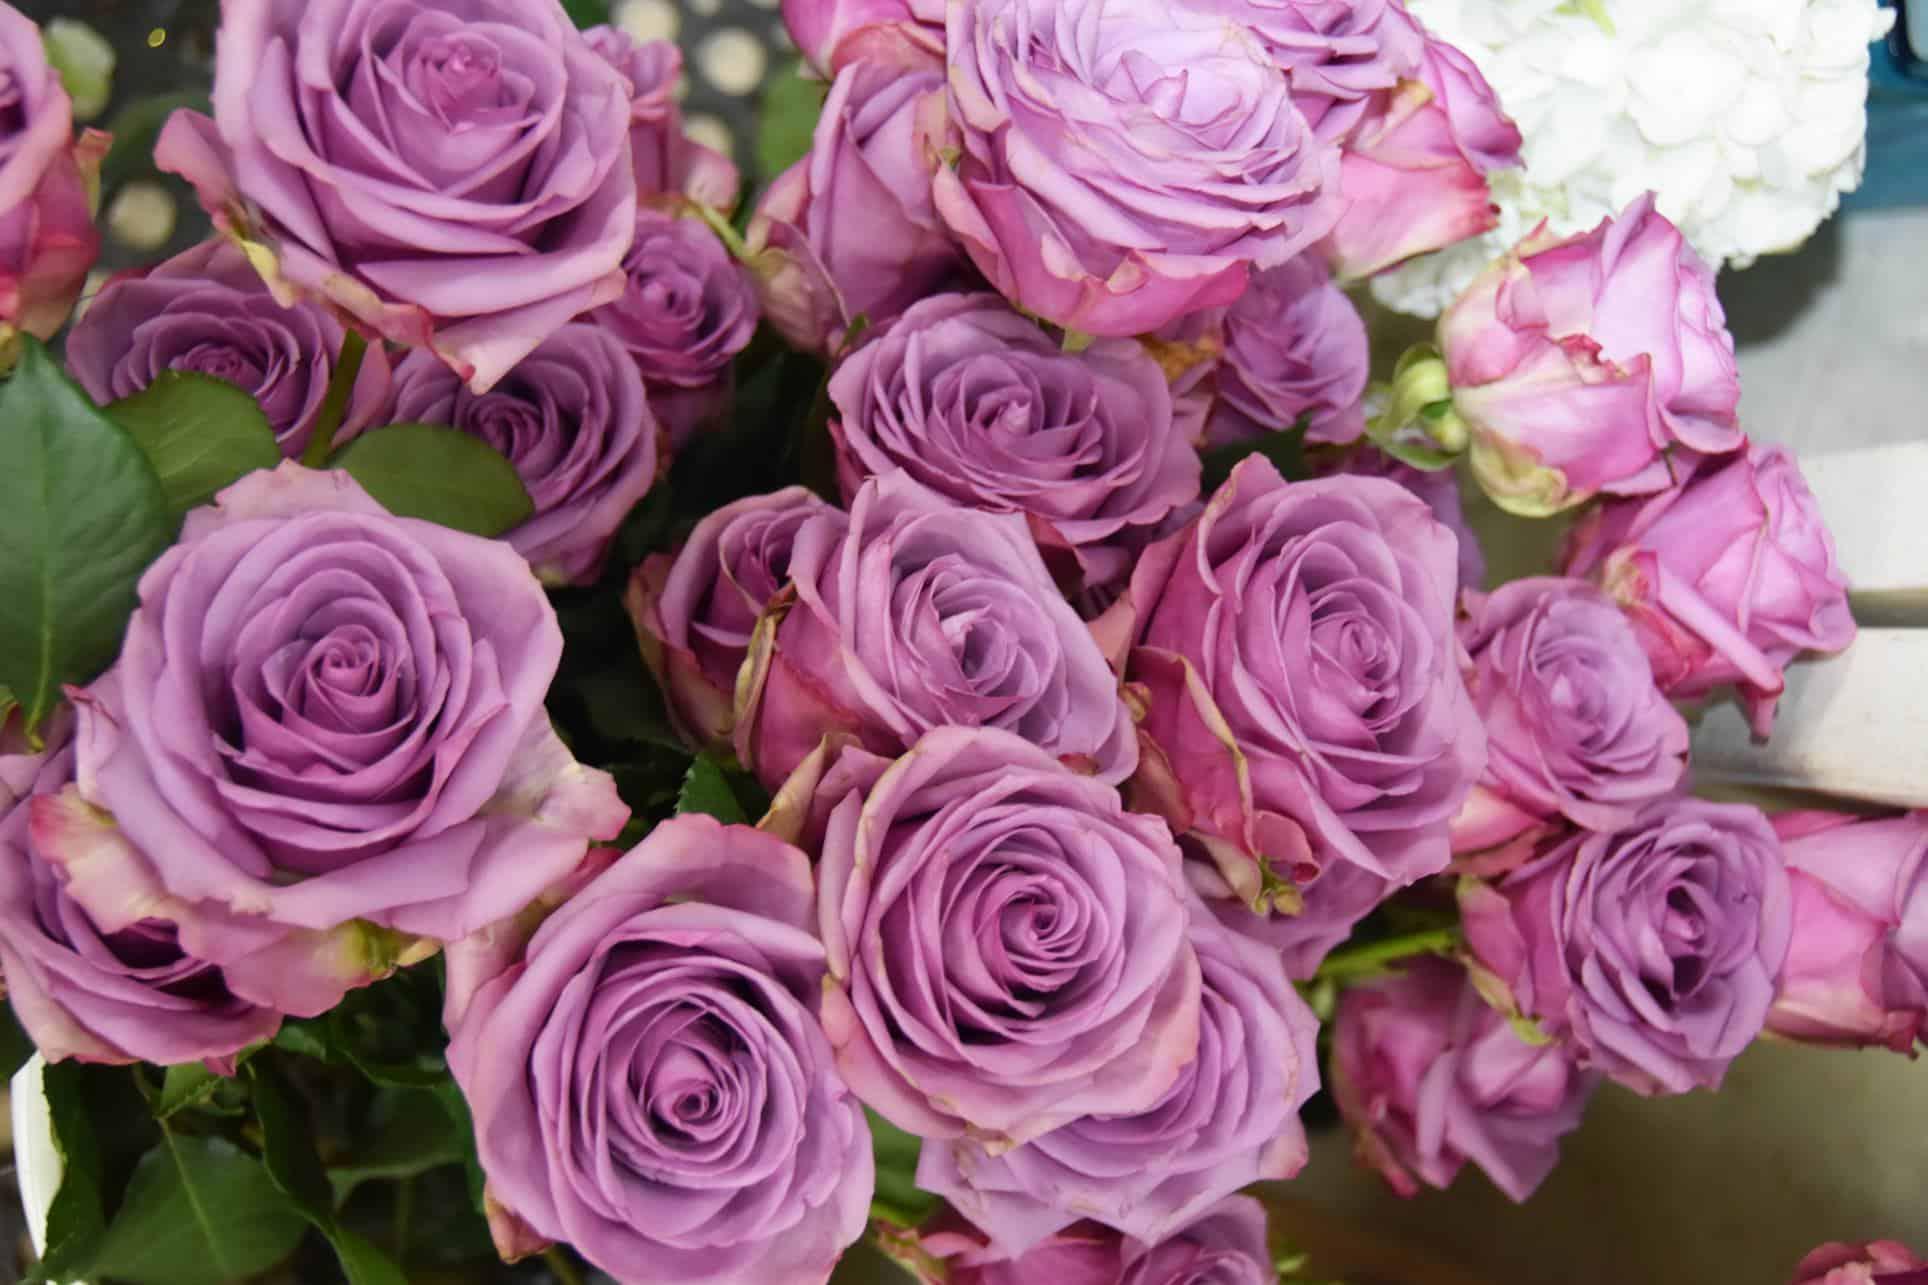 floral-department-3